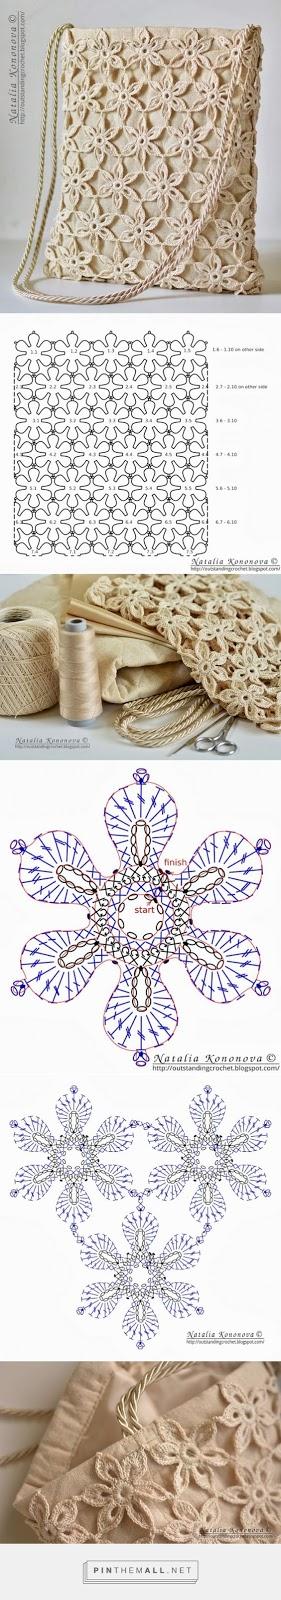 bolso tejido a crochet con motivos florales